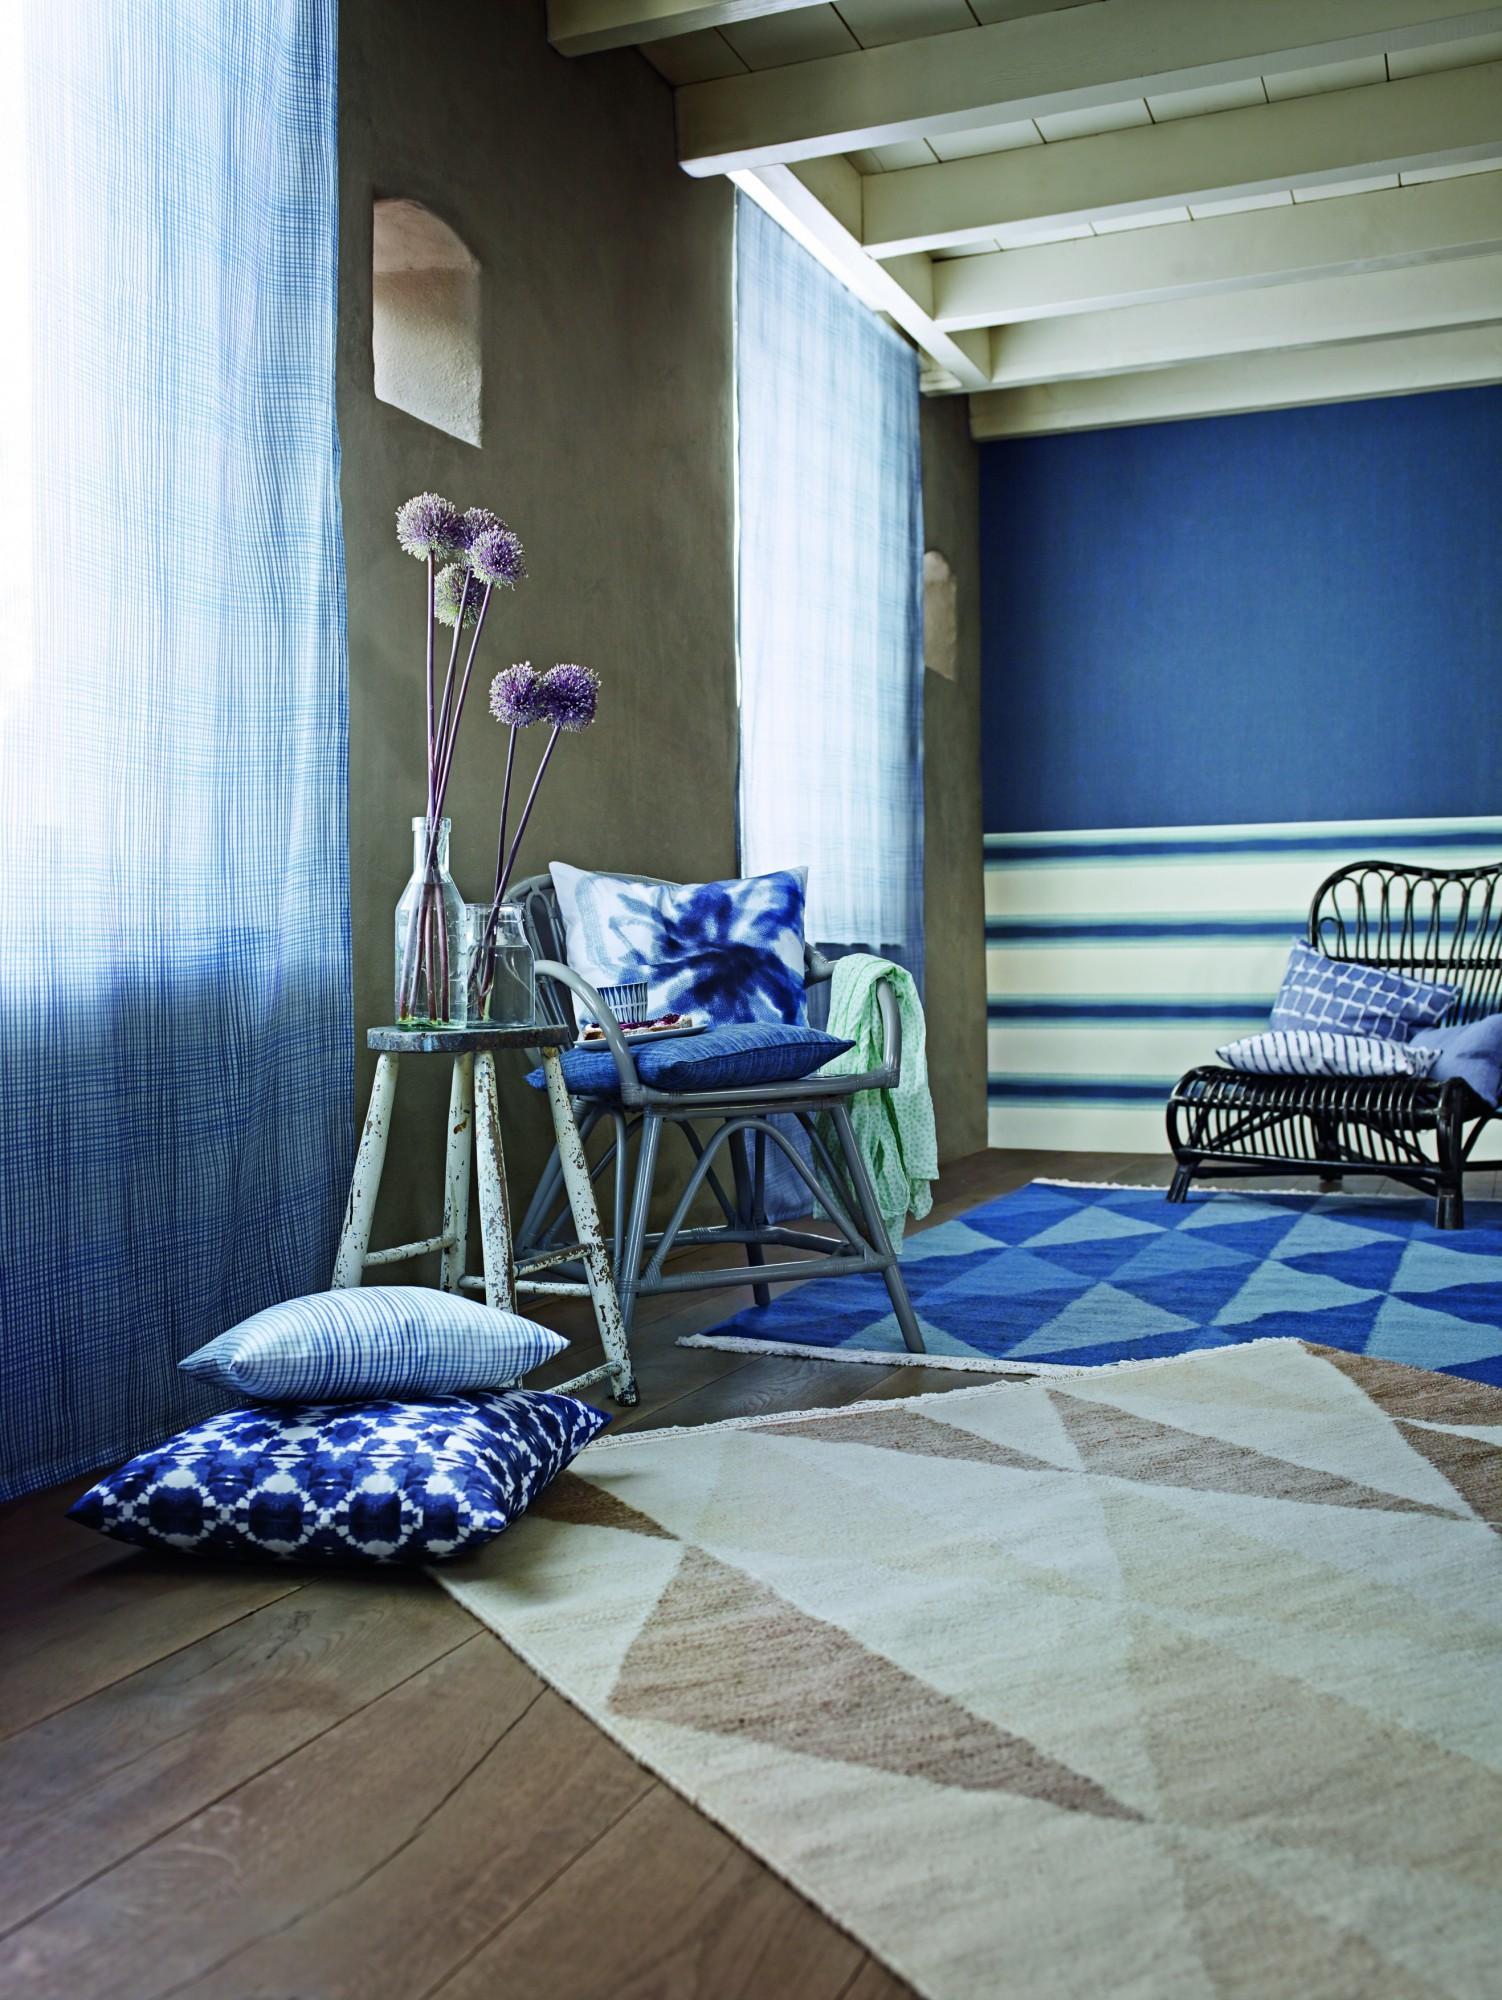 wei er dachbalken bilder ideen couch. Black Bedroom Furniture Sets. Home Design Ideas